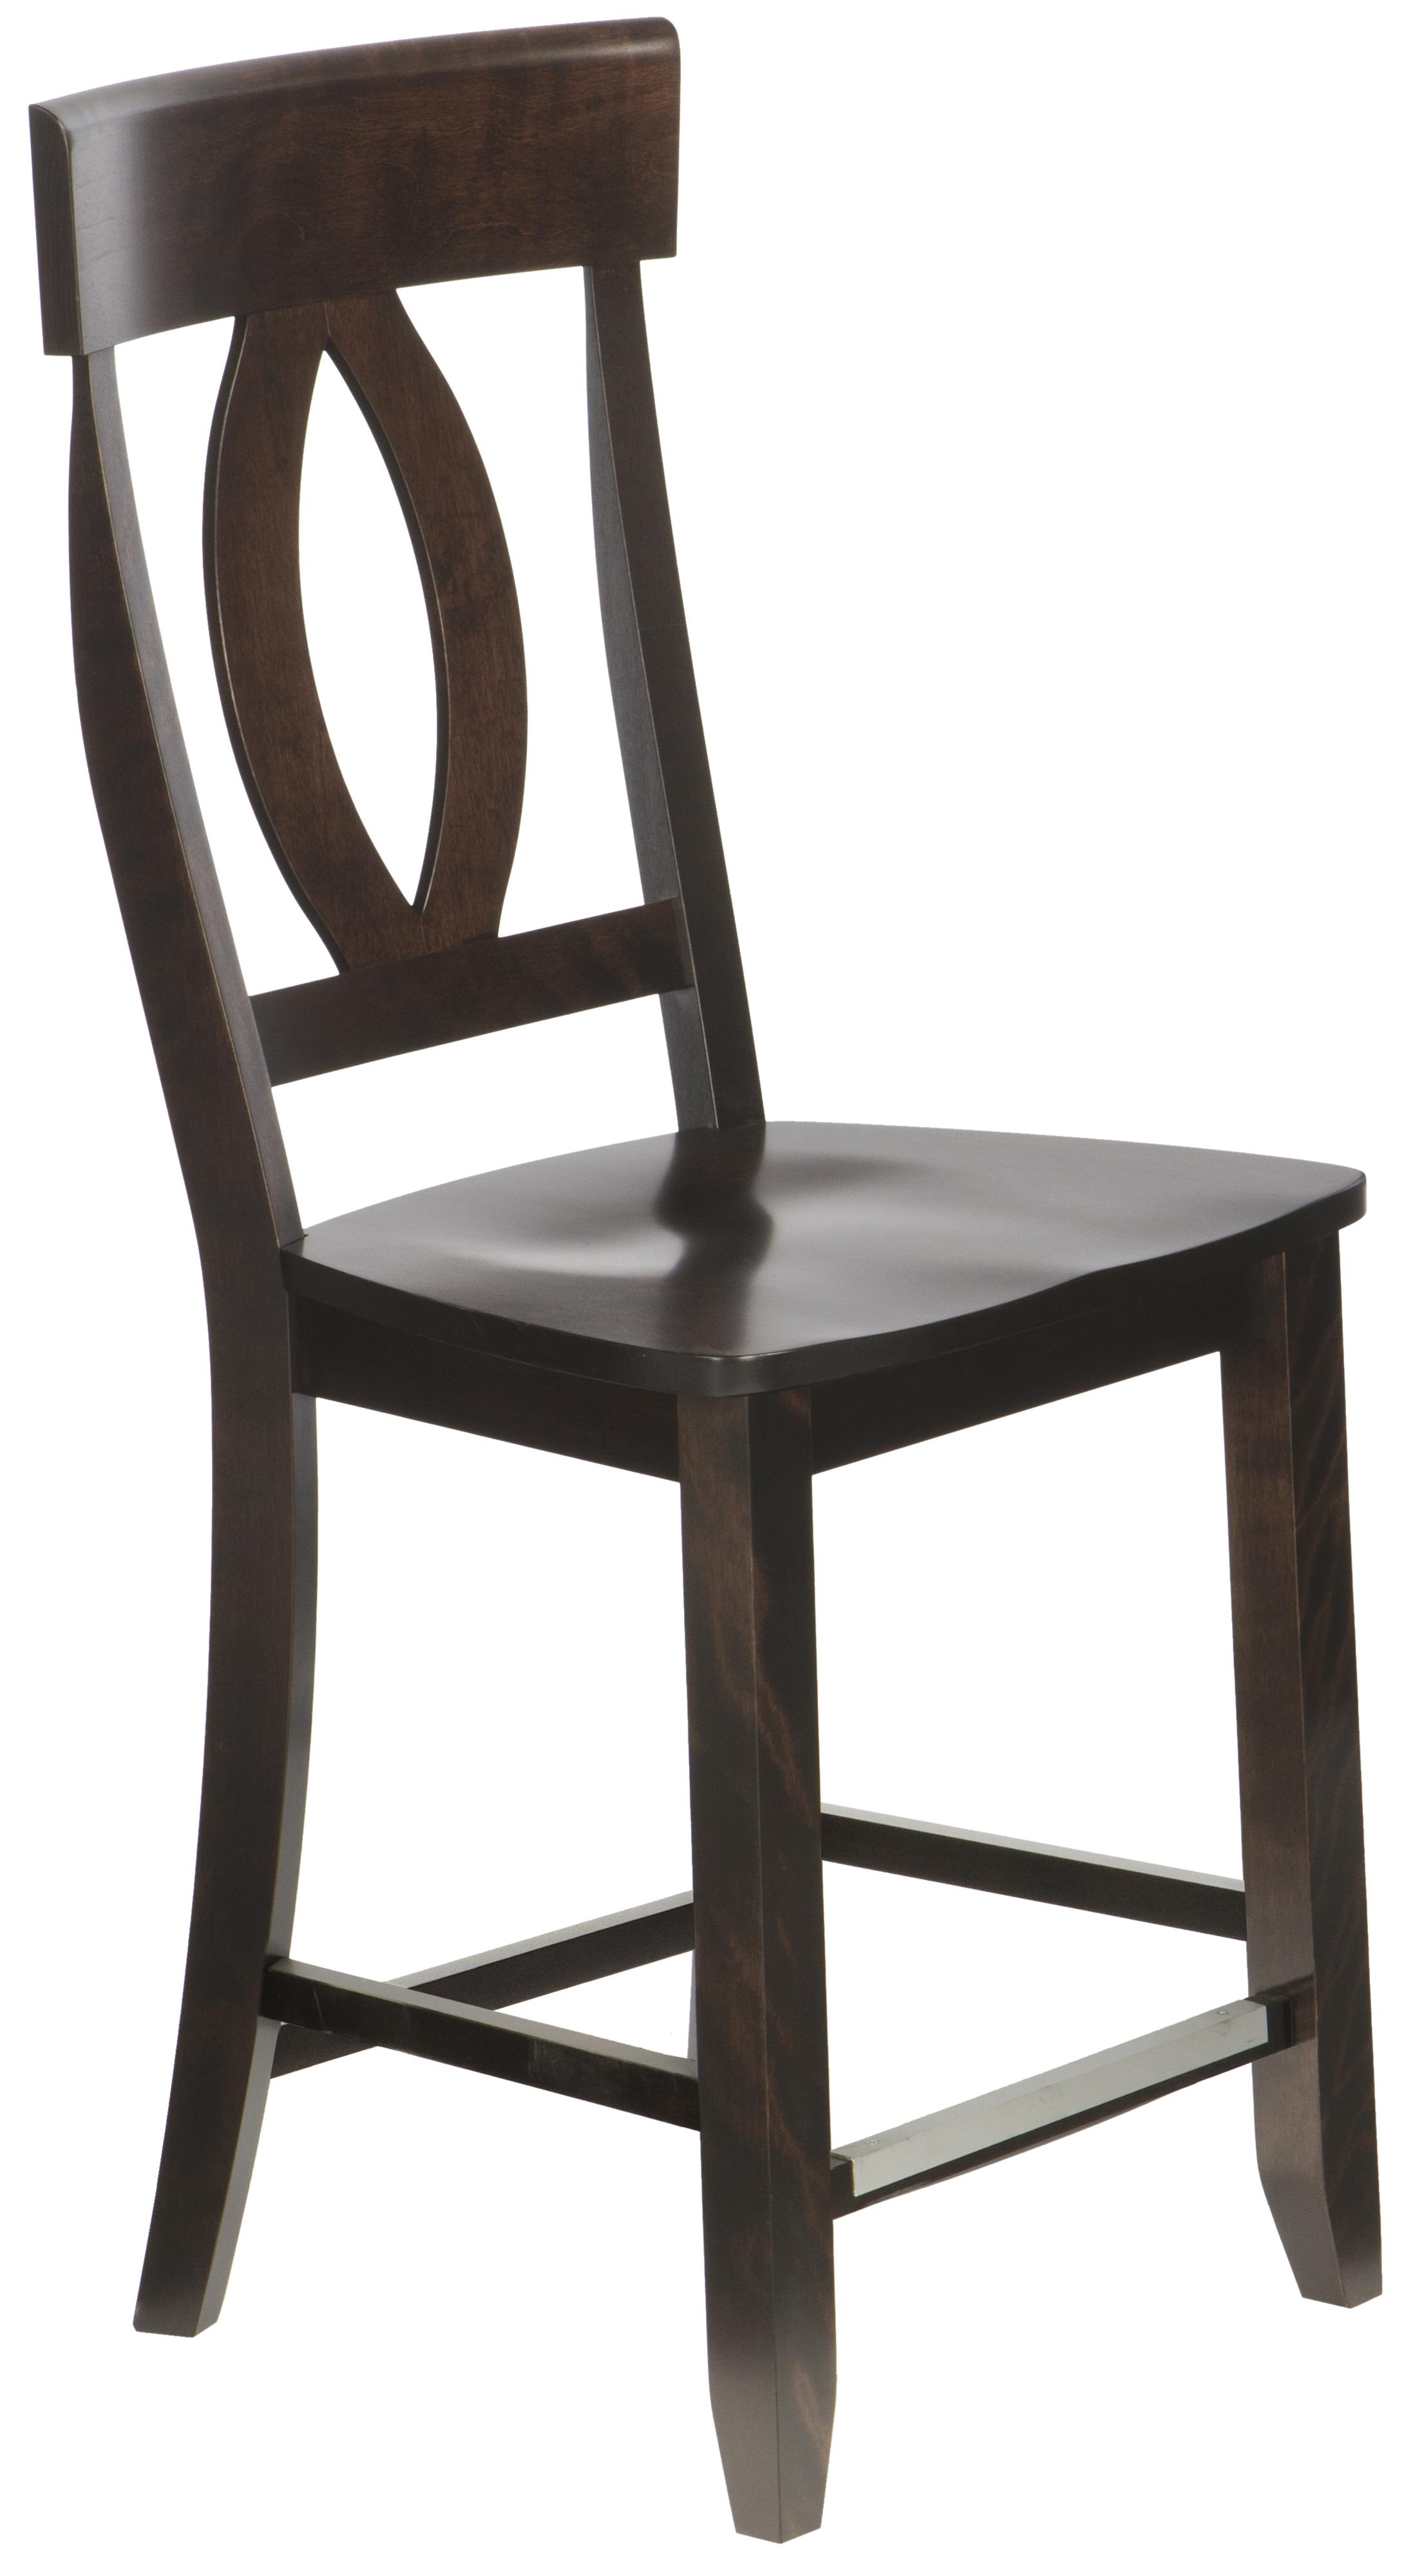 "Bar Stools Customizable 23"" Wood Seat Fixed Stool by Canadel at Williams & Kay"